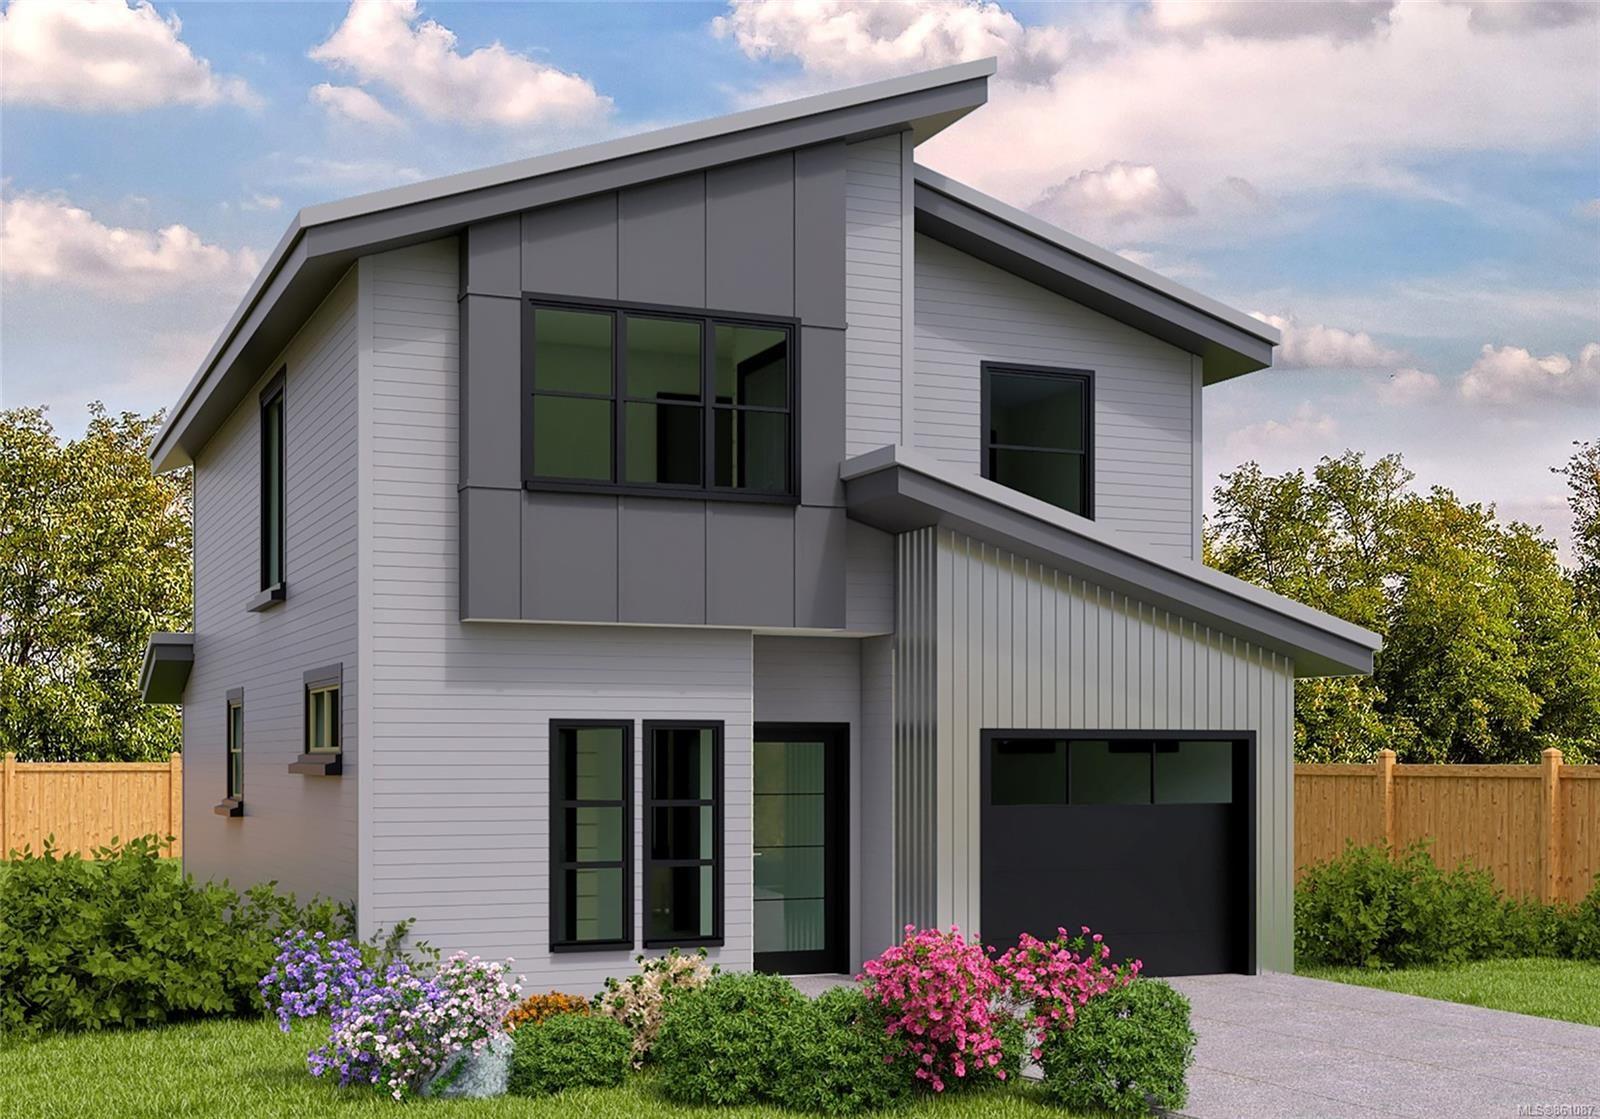 Main Photo: 138 1051 Shawnigan Lake Rd in : ML Shawnigan House for sale (Malahat & Area)  : MLS®# 861087